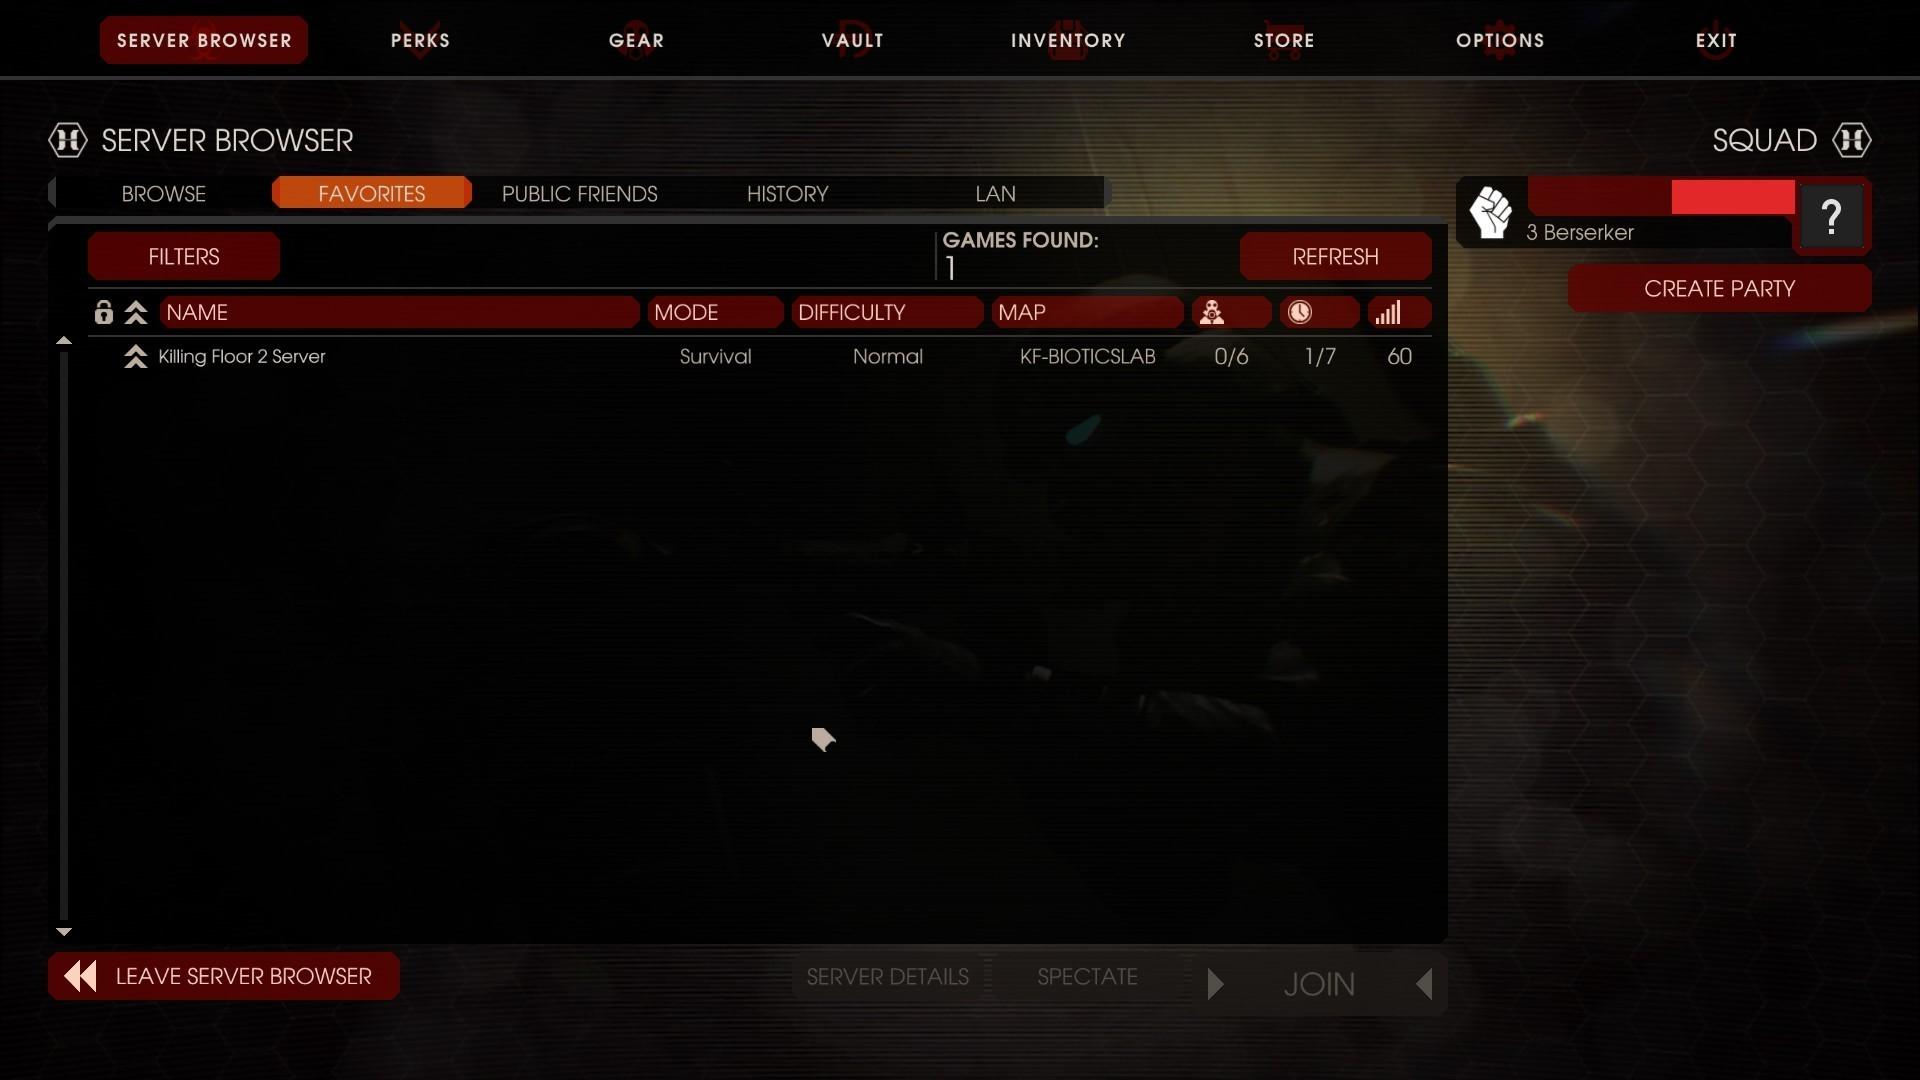 Killing Floor 2 Server in favorites